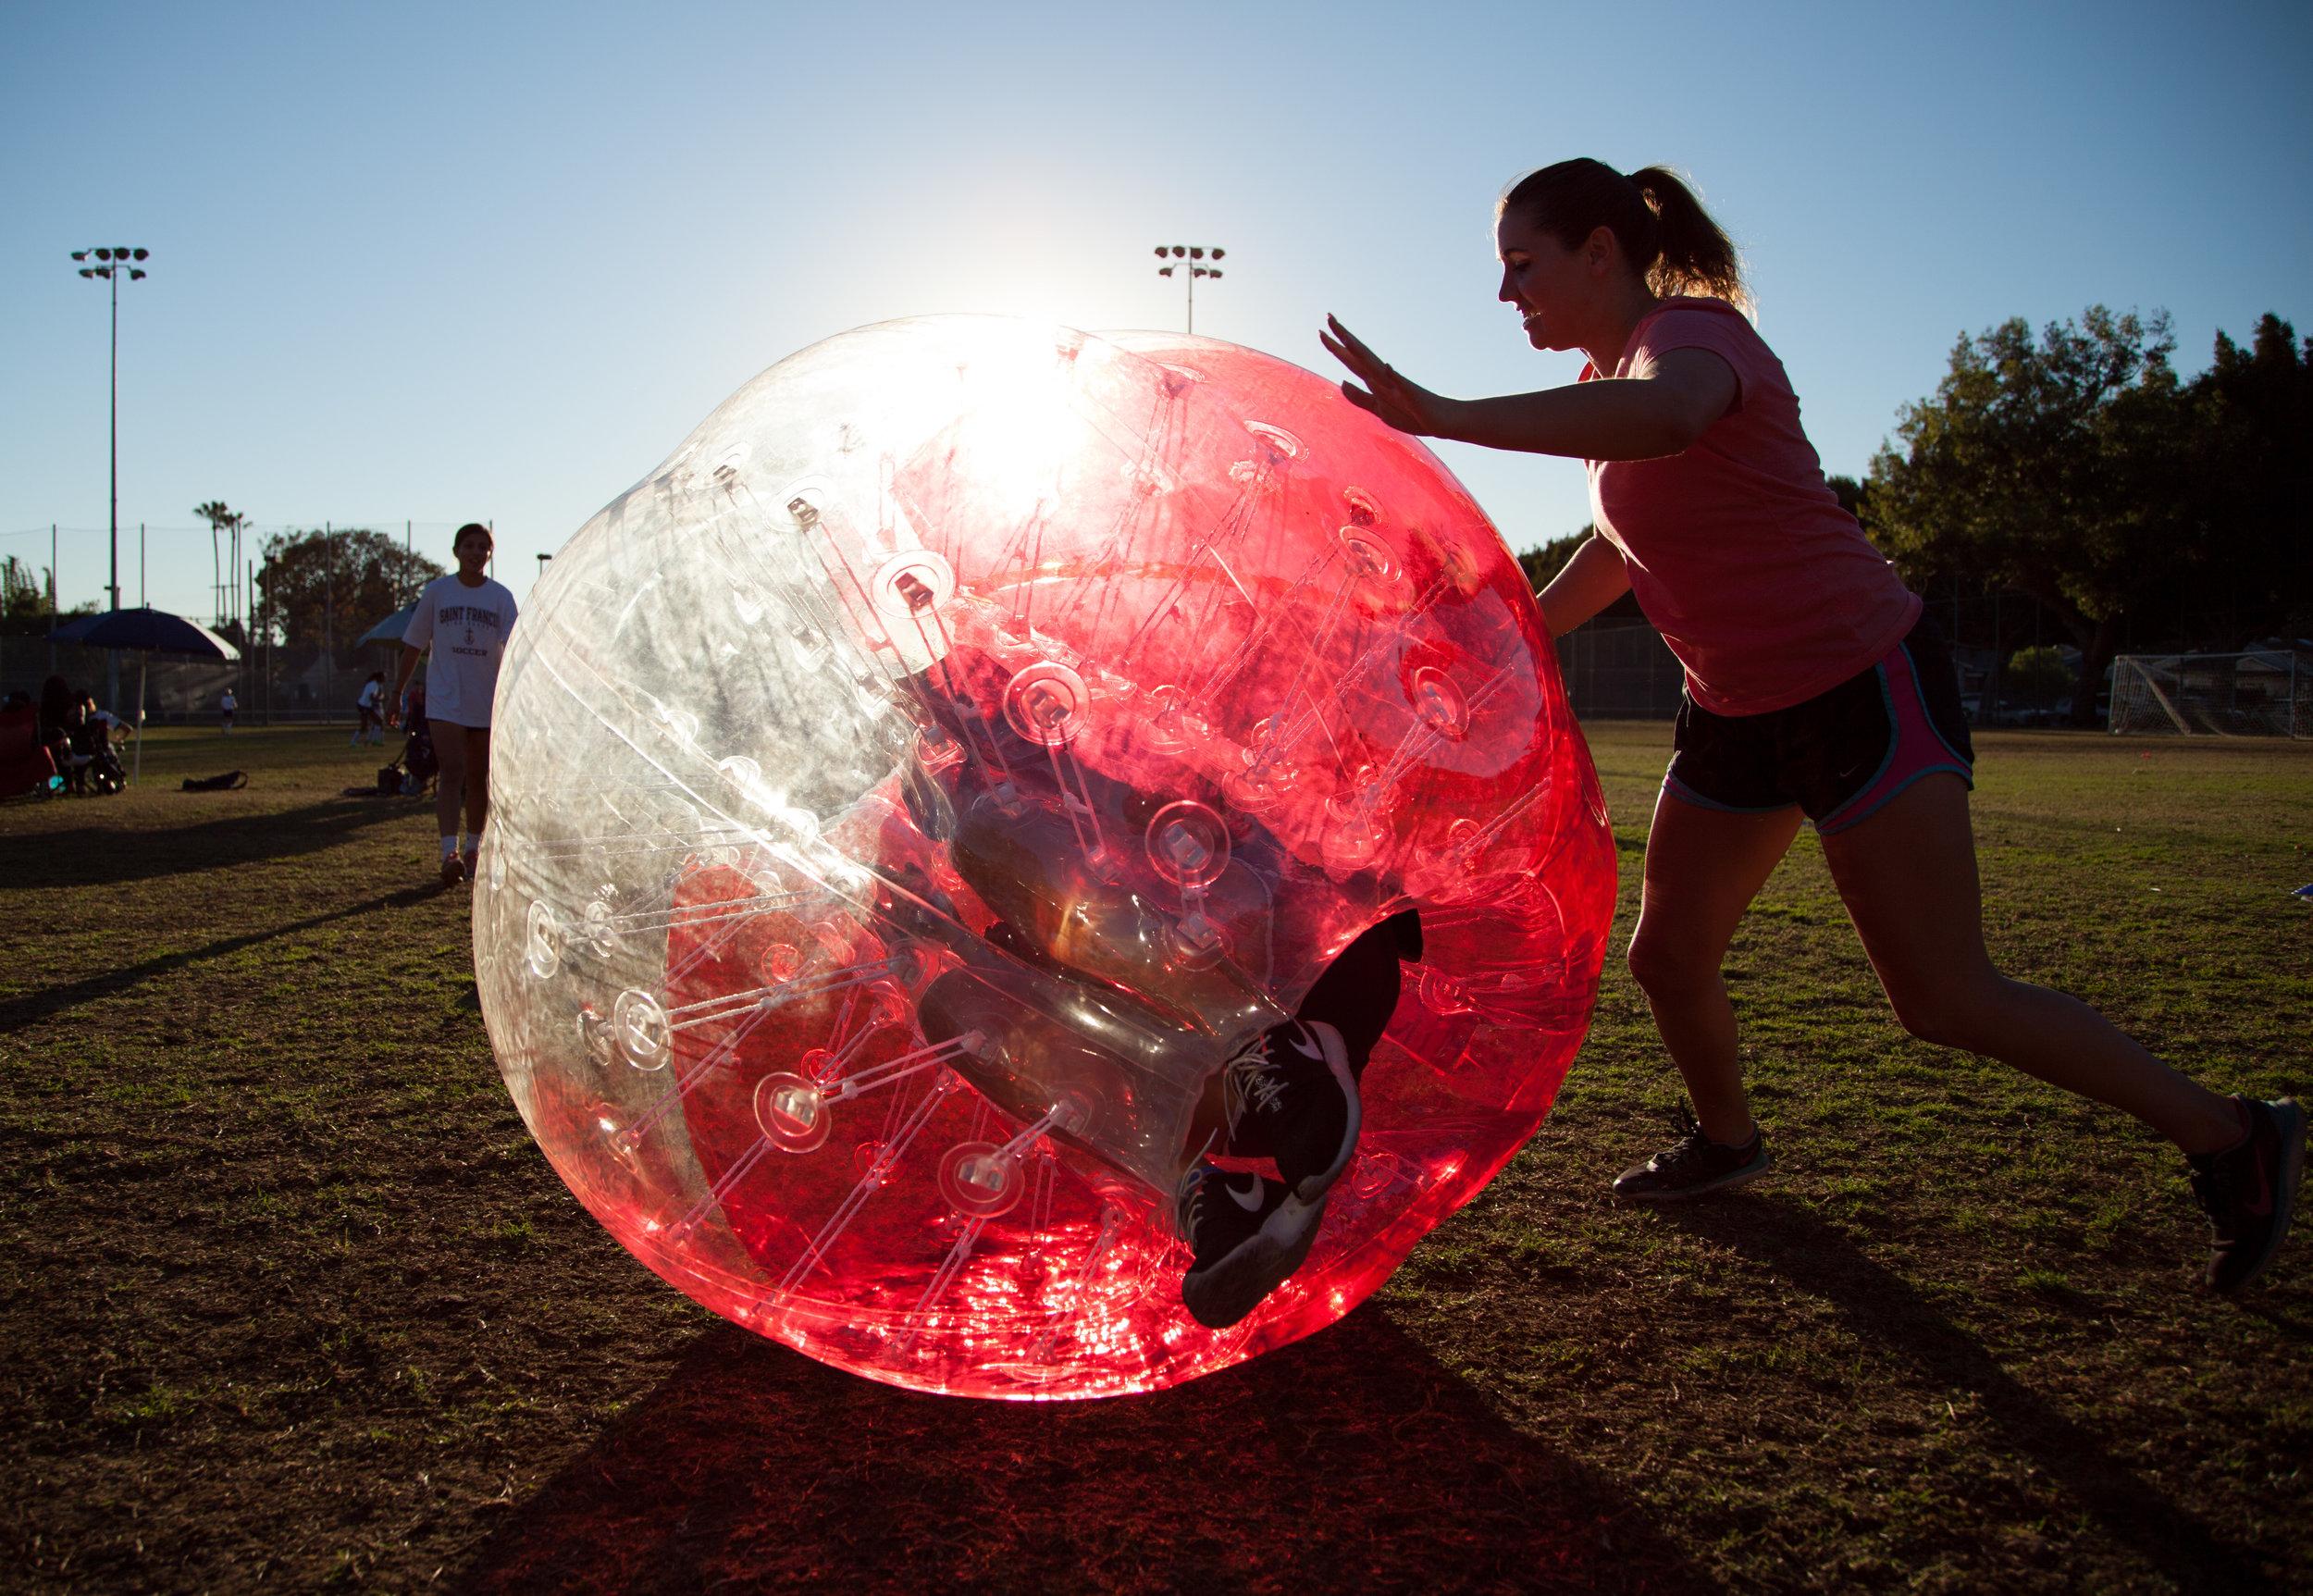 rolling friends in a bubble suit is a great bubble soccer game west la